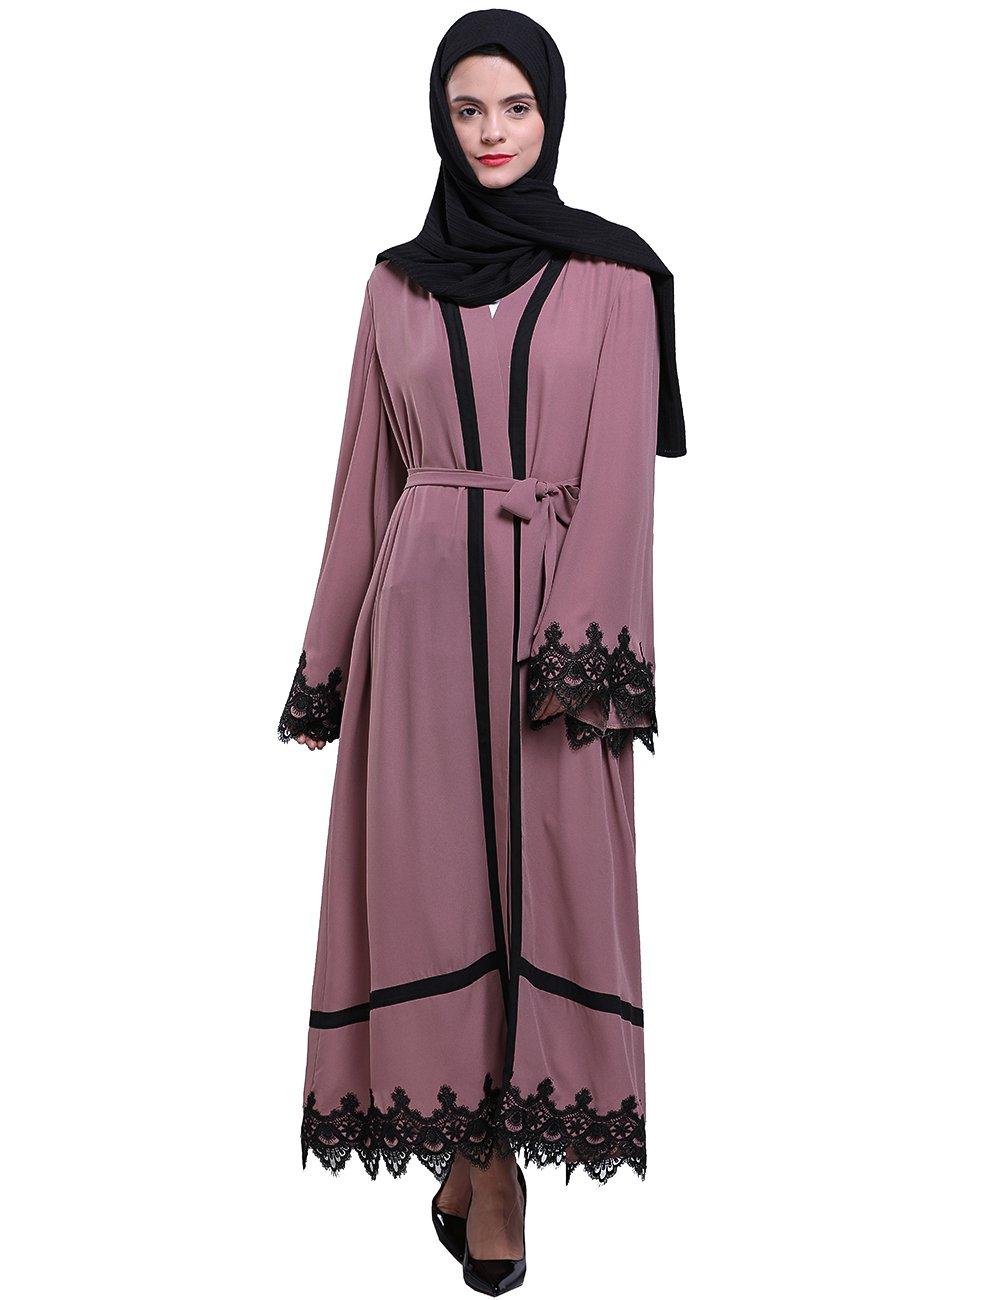 Fancyqube Women's Muslim Islamic Kaftan Abayas Lace Stitching Cardigan Loose Robe Dark Pink M